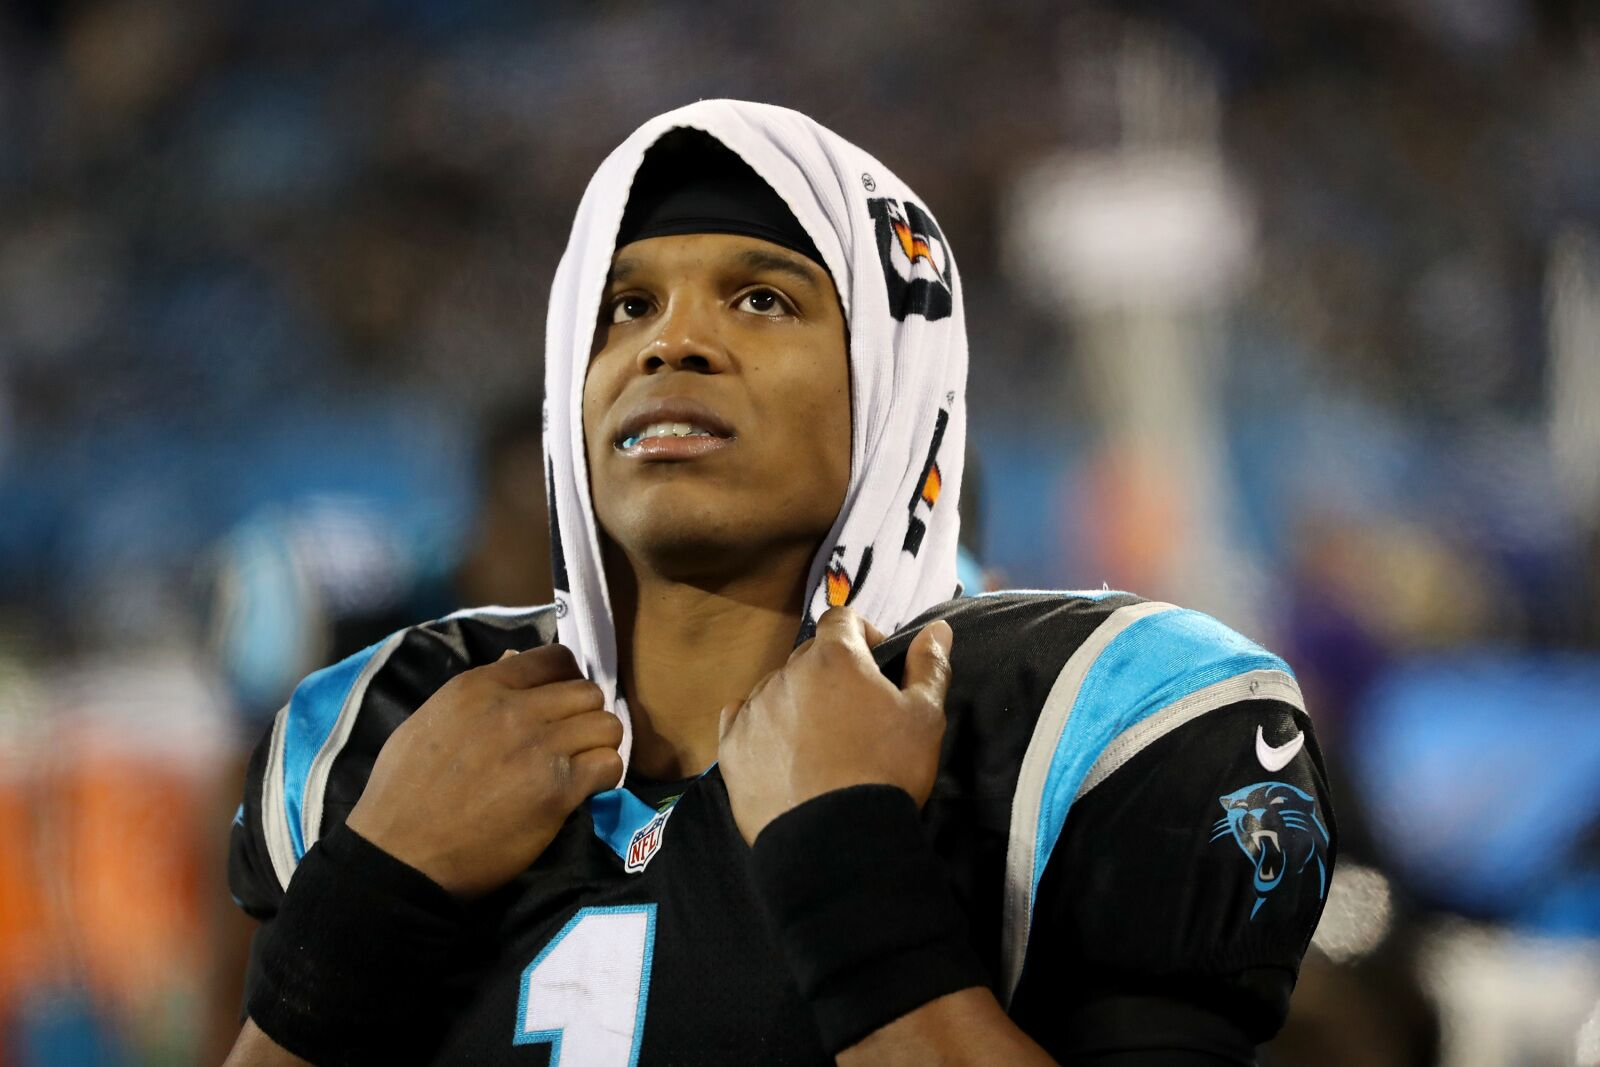 2019 NFL draft: Carolina Panthers 3-round mock draft